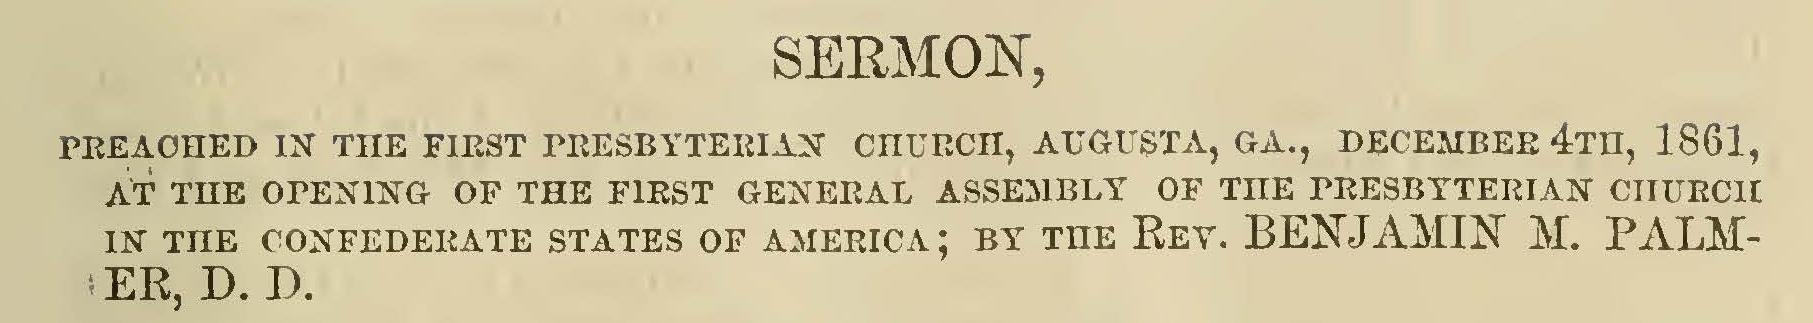 Palmer, Benjamin Morgan, Opening Sermon Presbyterian Church CSA Title Page.jpg